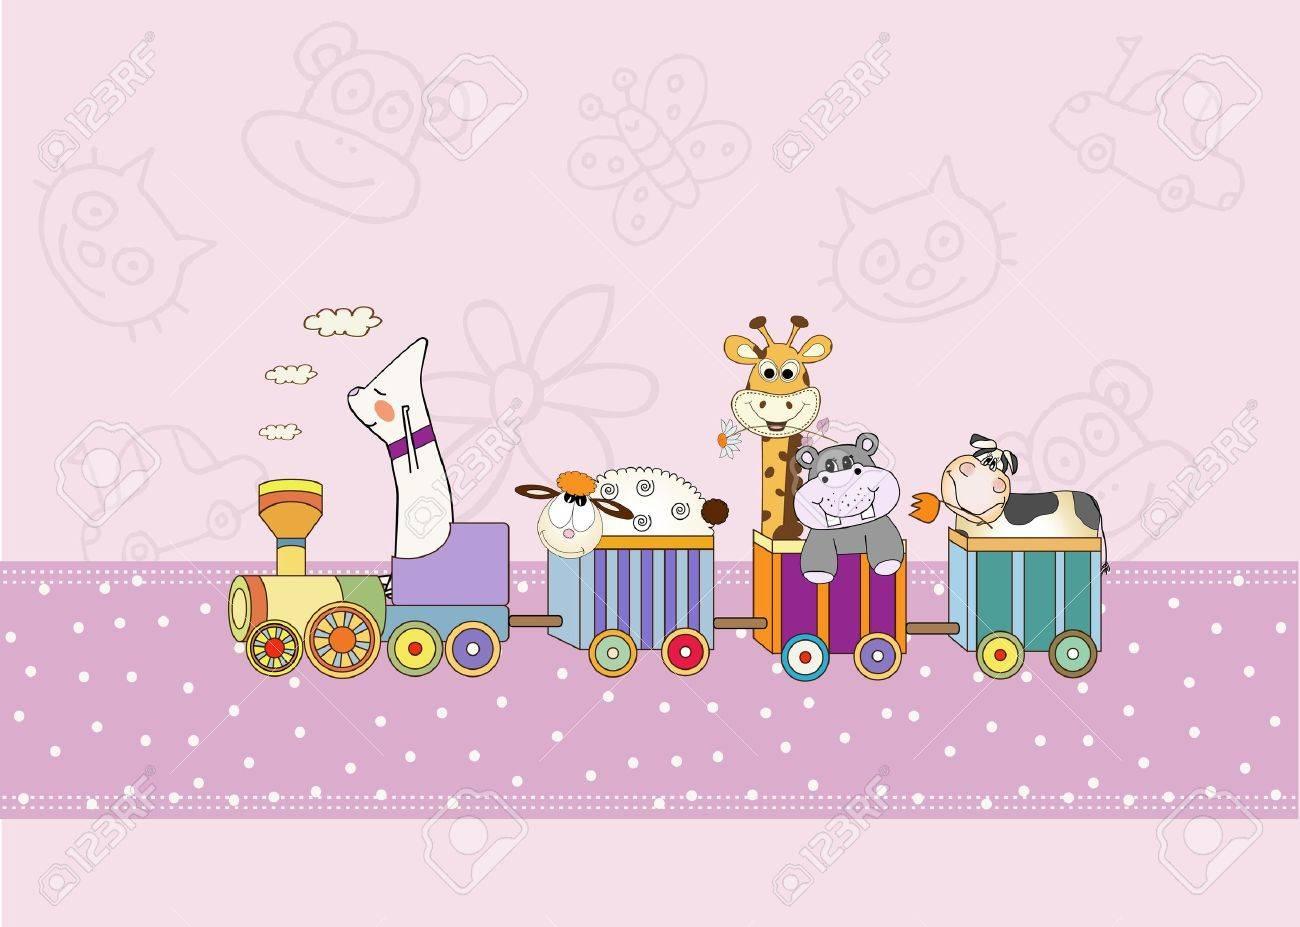 customizable birthday card with animal toys train Stock Vector - 9806443